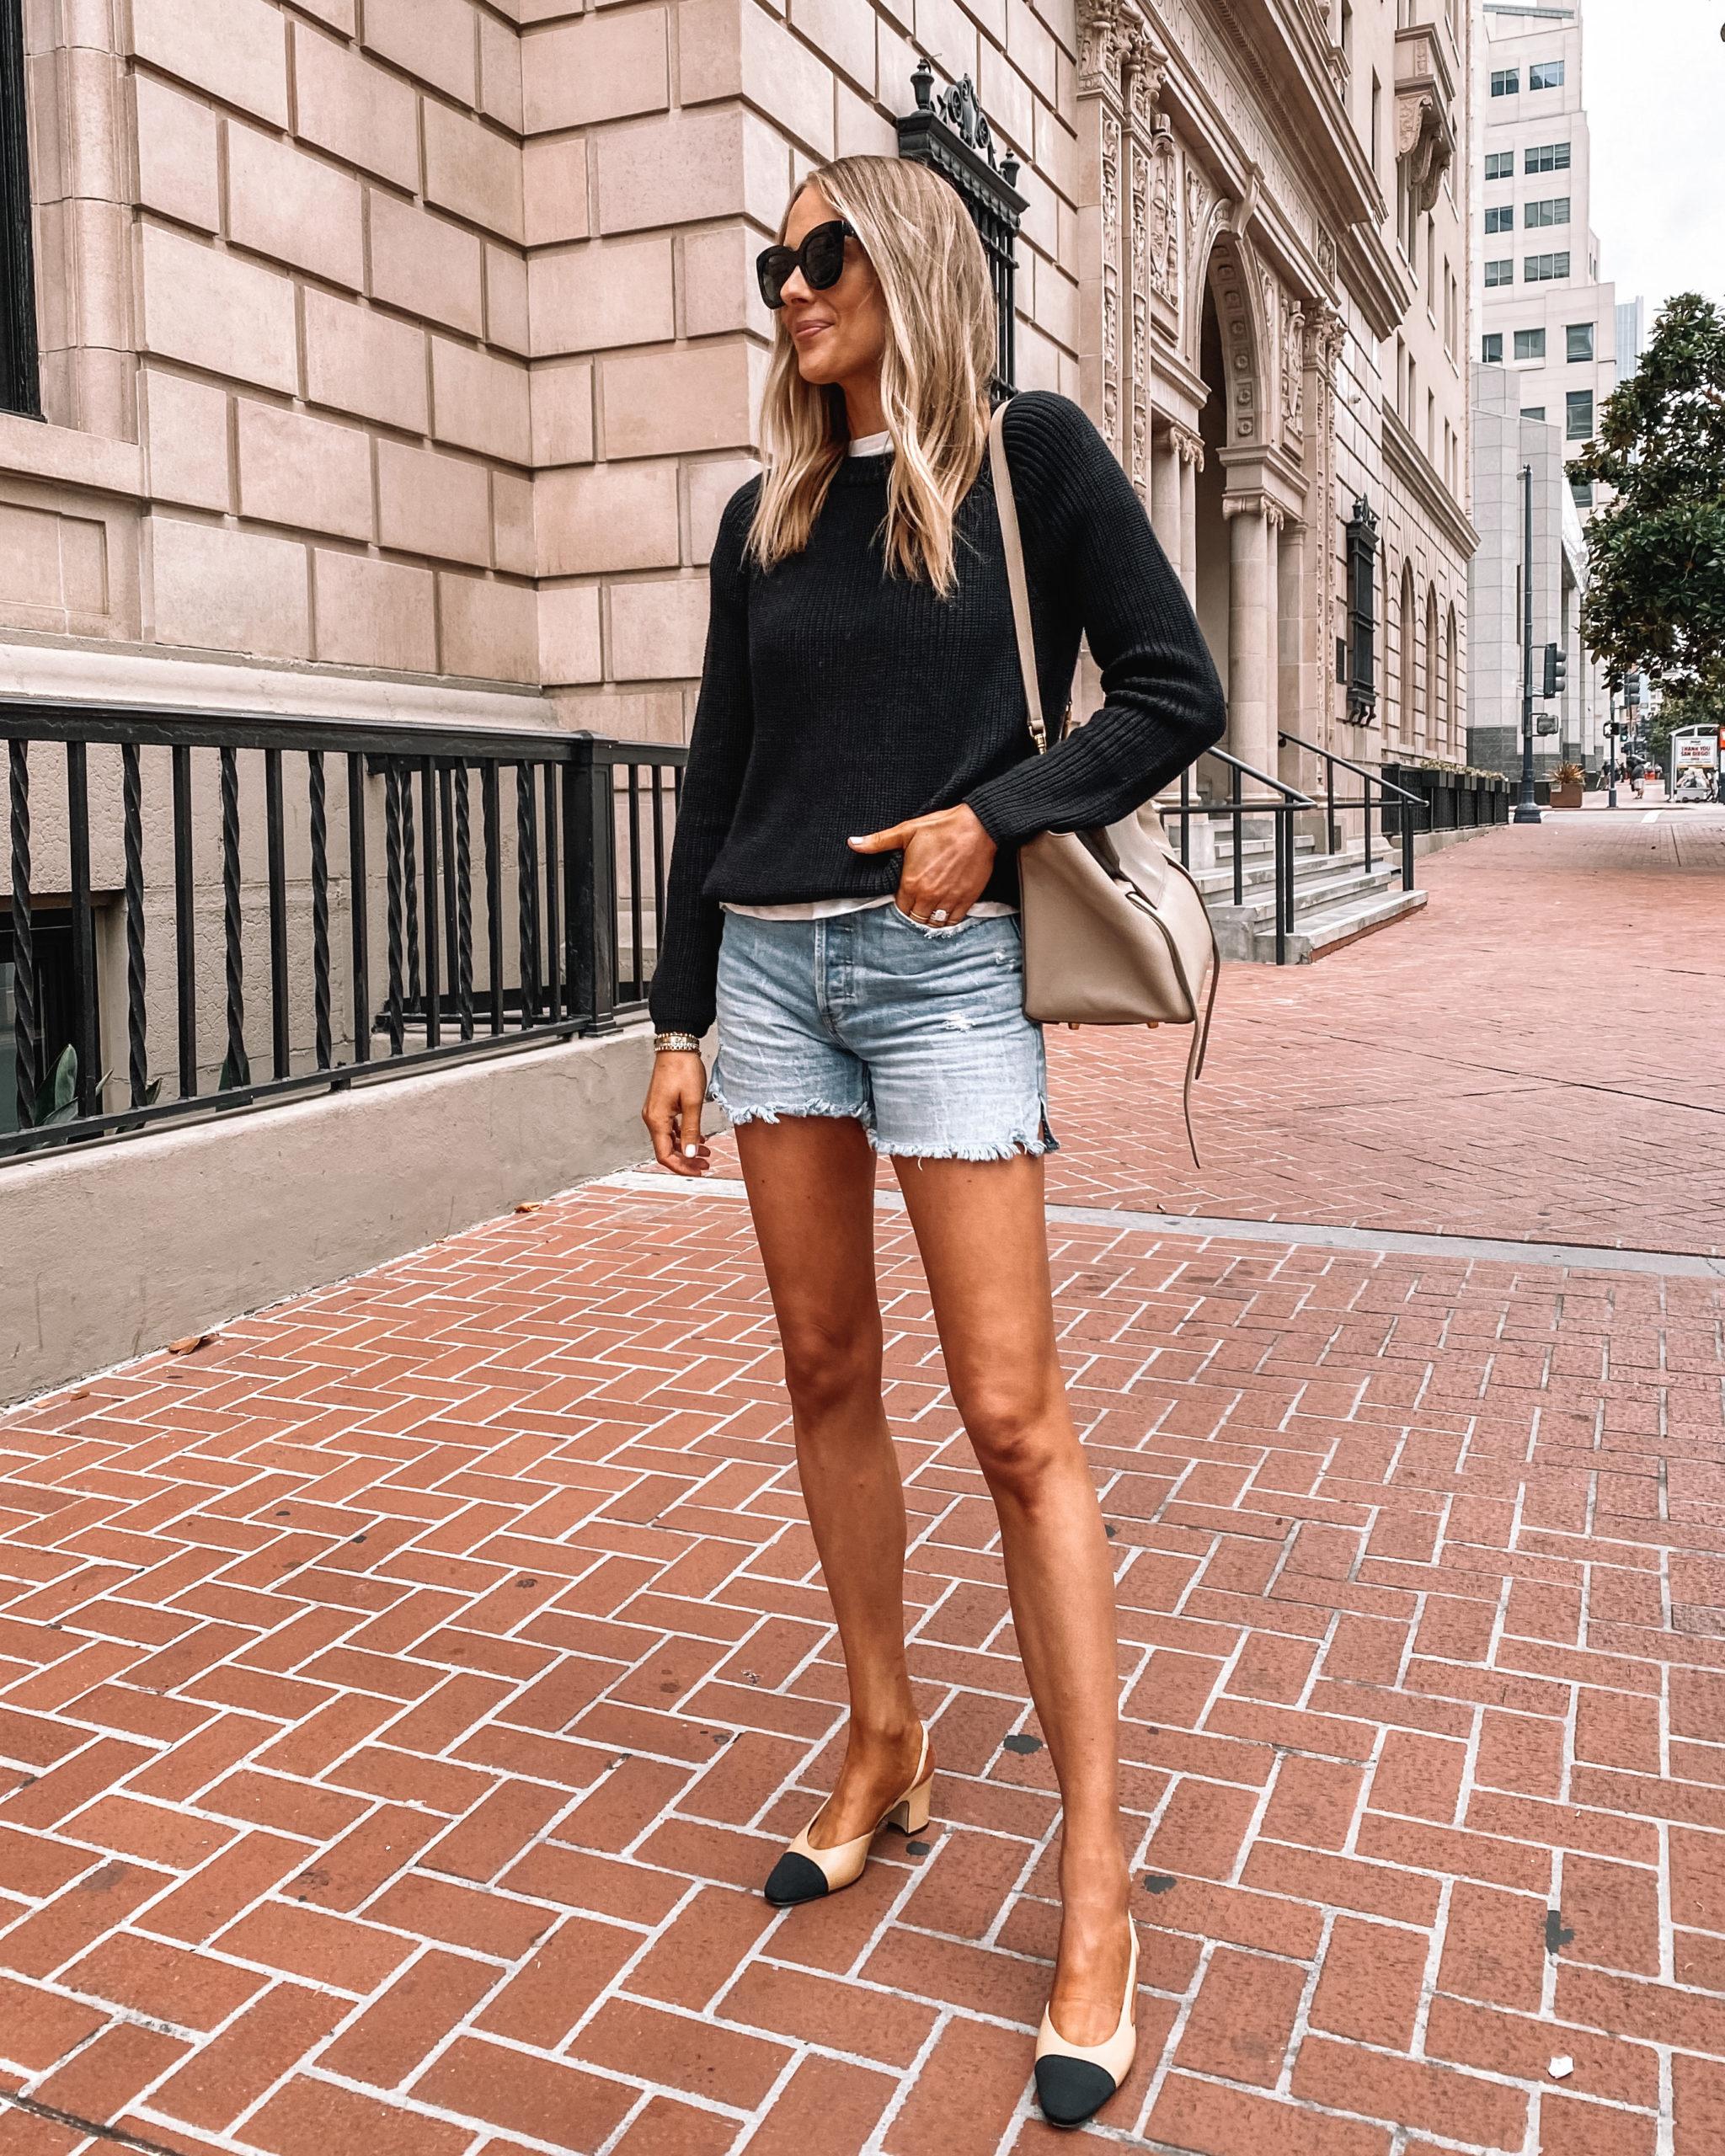 Fashion Jackson Wearing Black Jenni Kayne Cotton Sweater Denim Shorts, Chanel Slingbacks